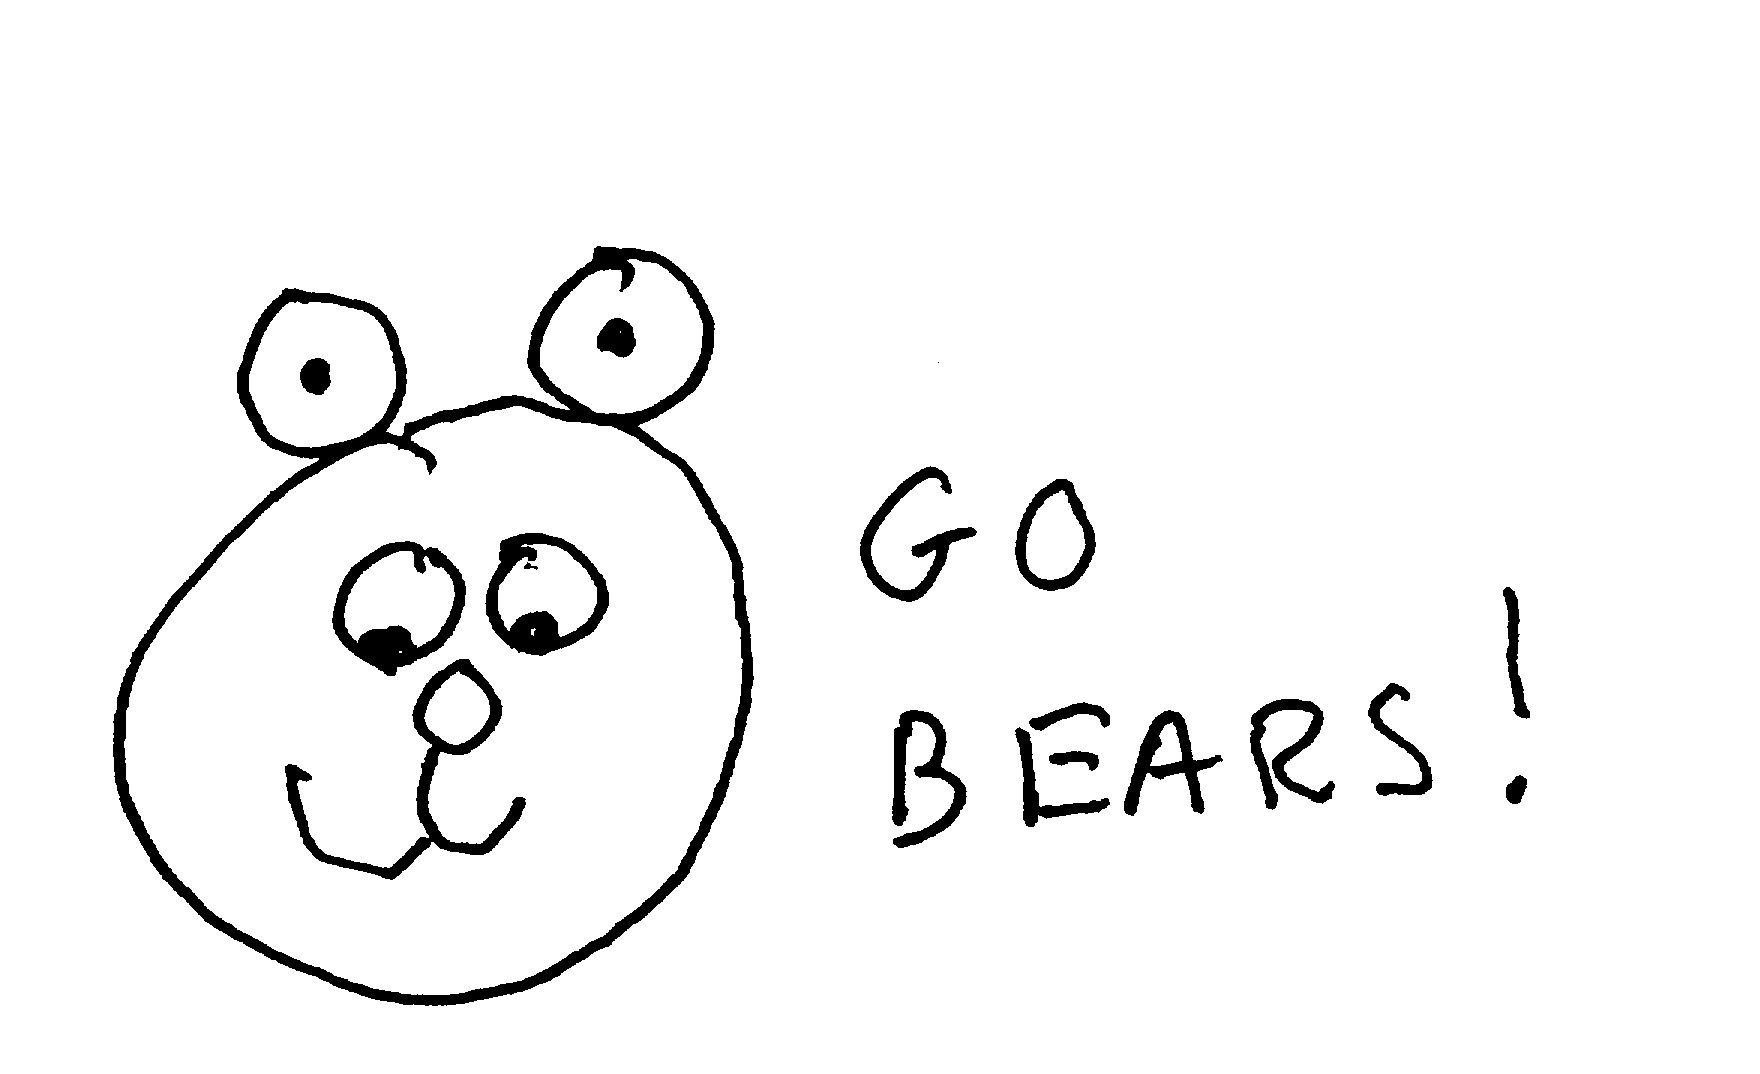 A Great Bear